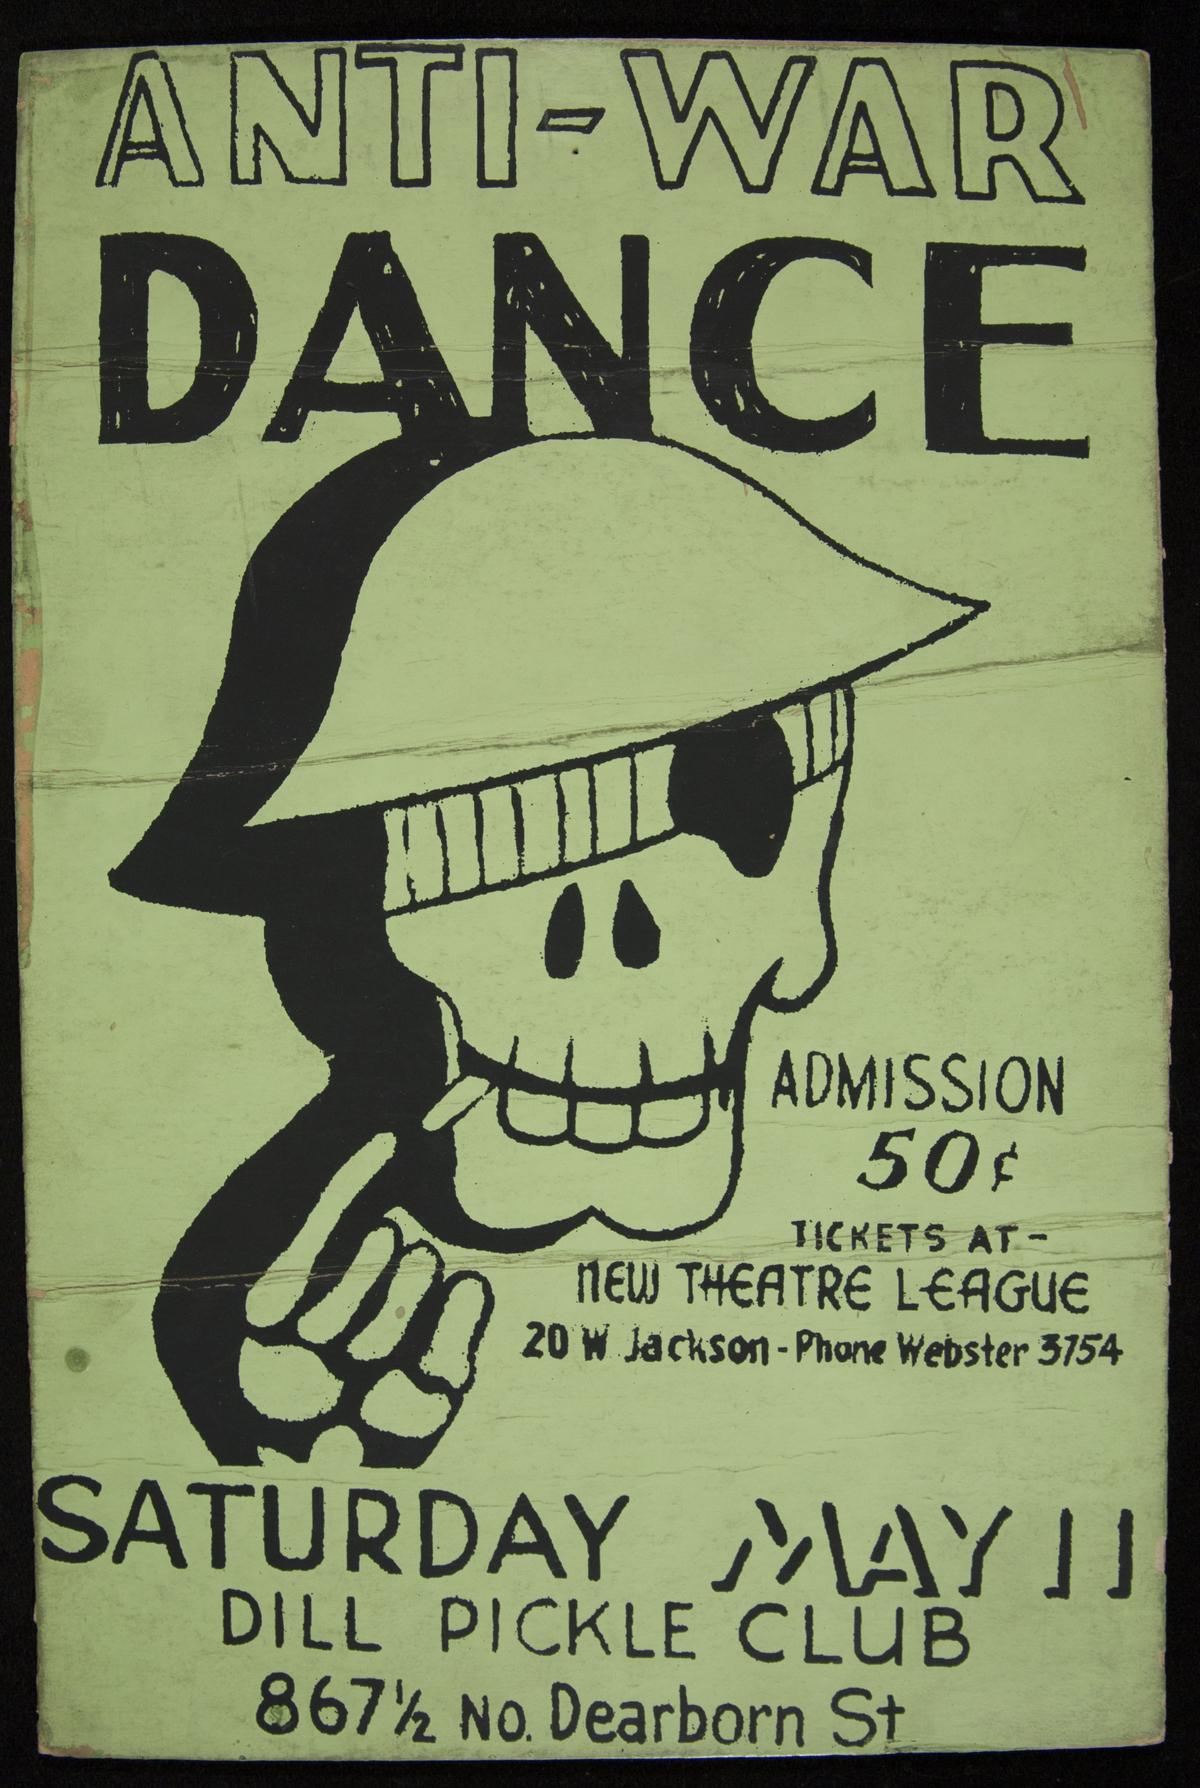 Anti-War Dance, Saturday, May 11